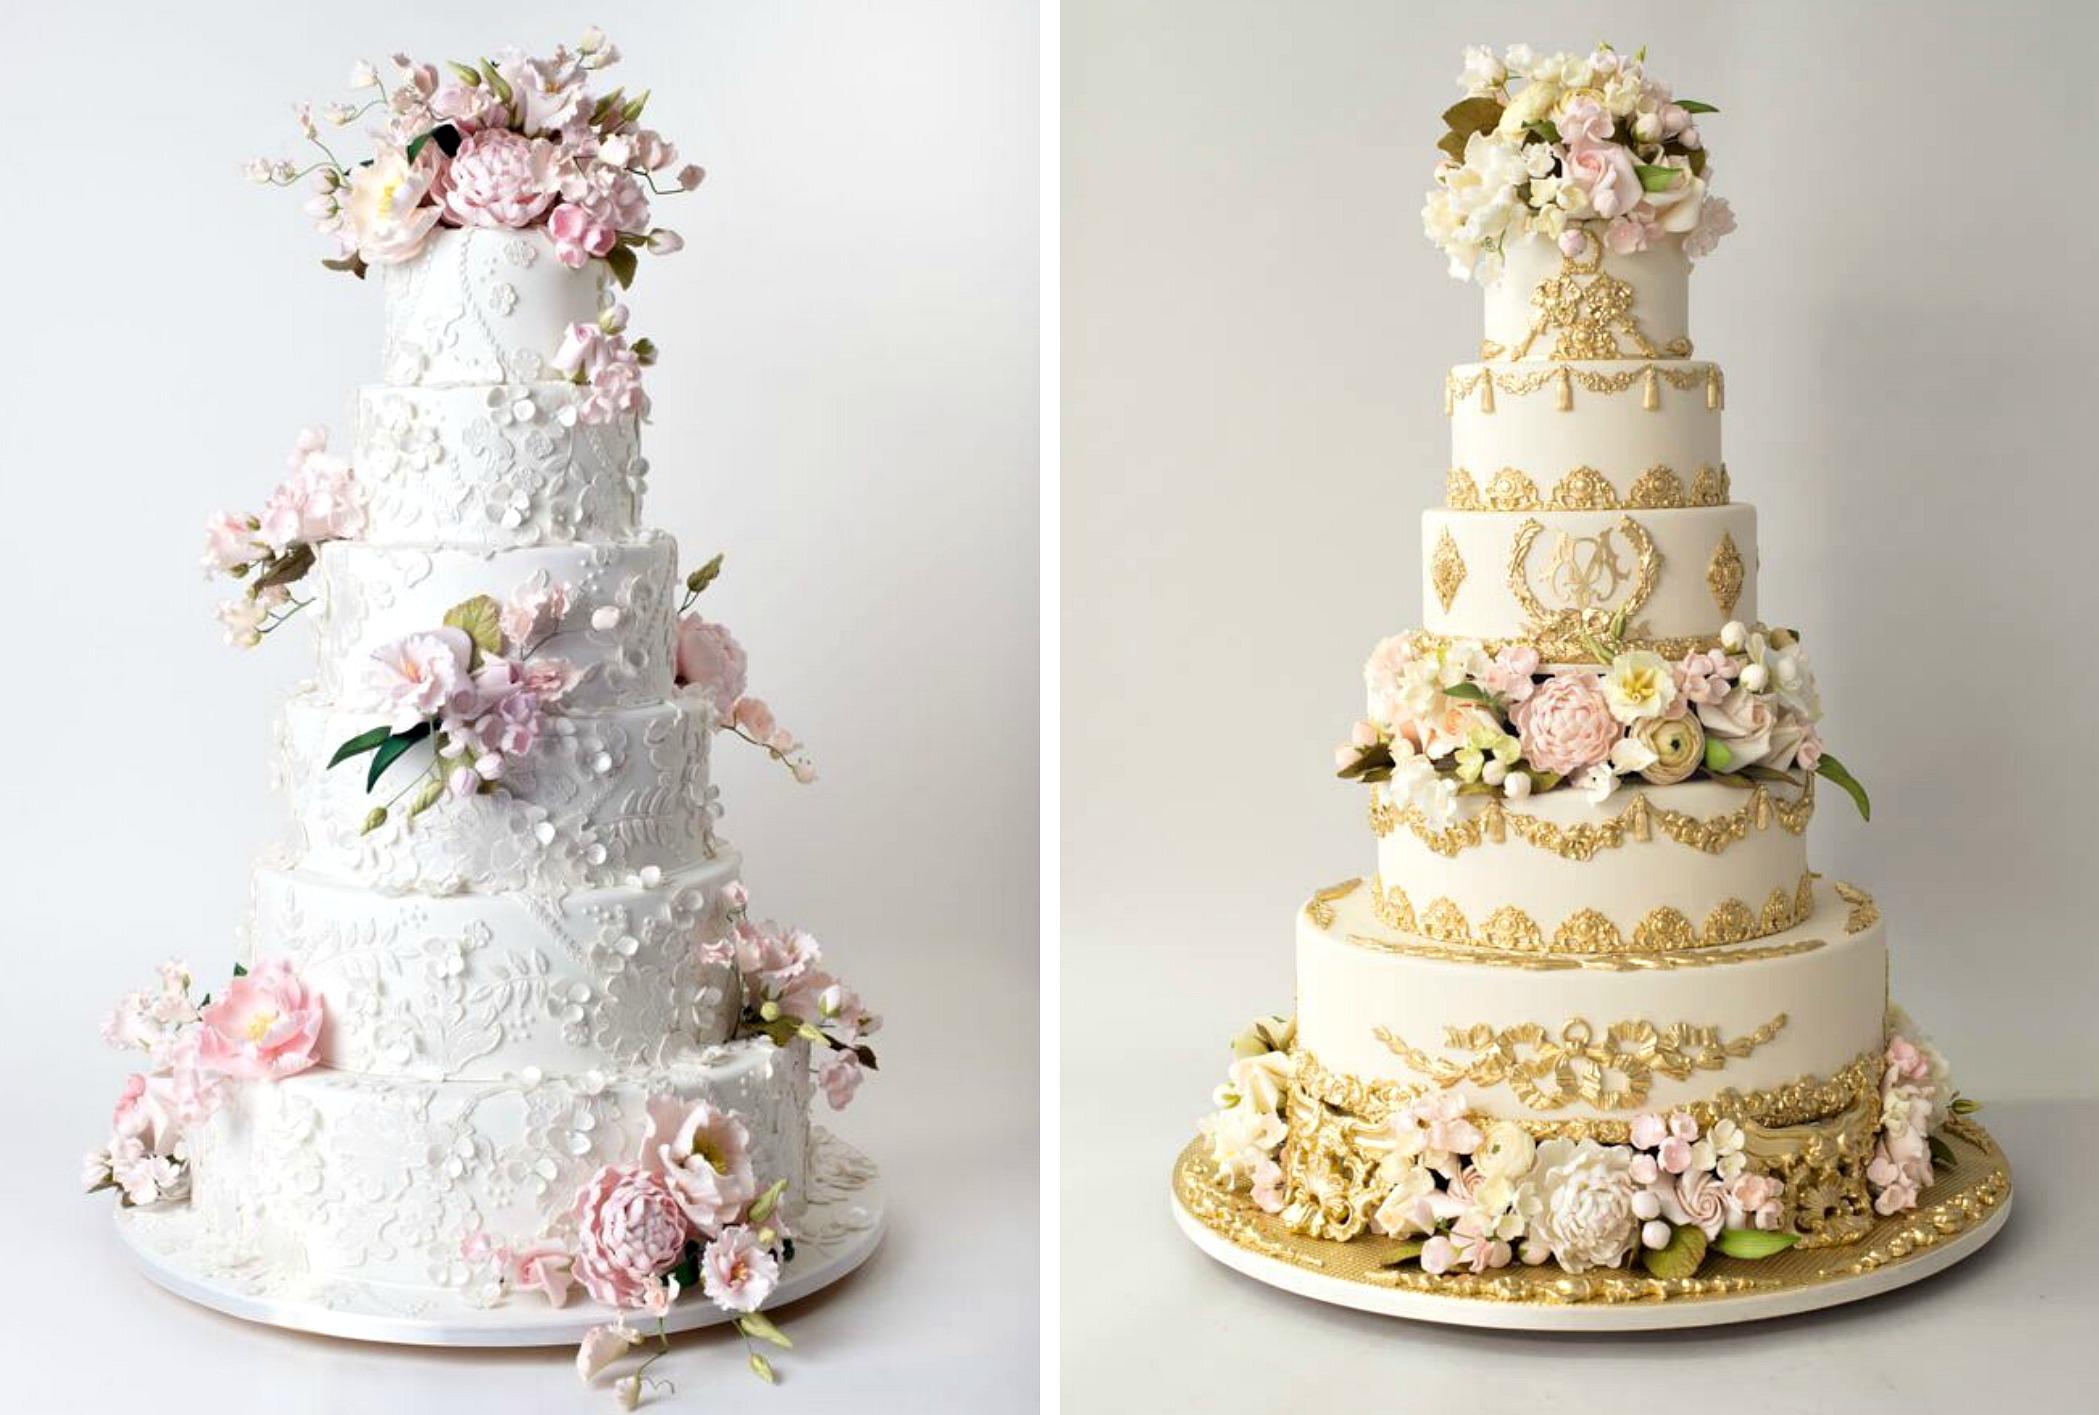 Cheap wedding cakes for the holiday: Wedding cake taste off new york ny